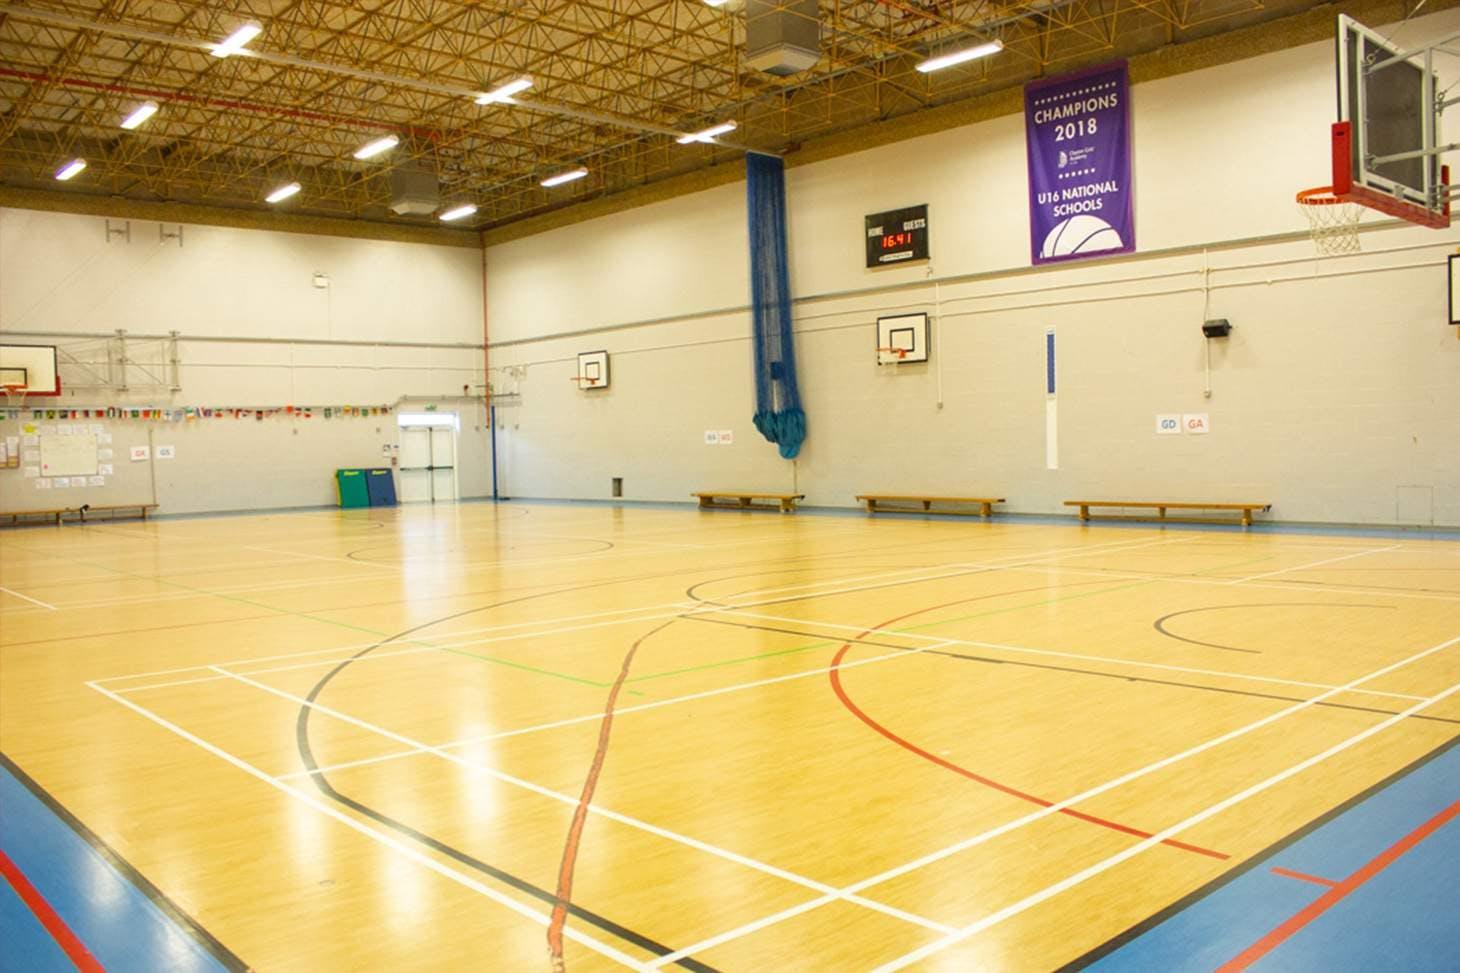 Clapton Girls' School Court   Sports hall basketball court